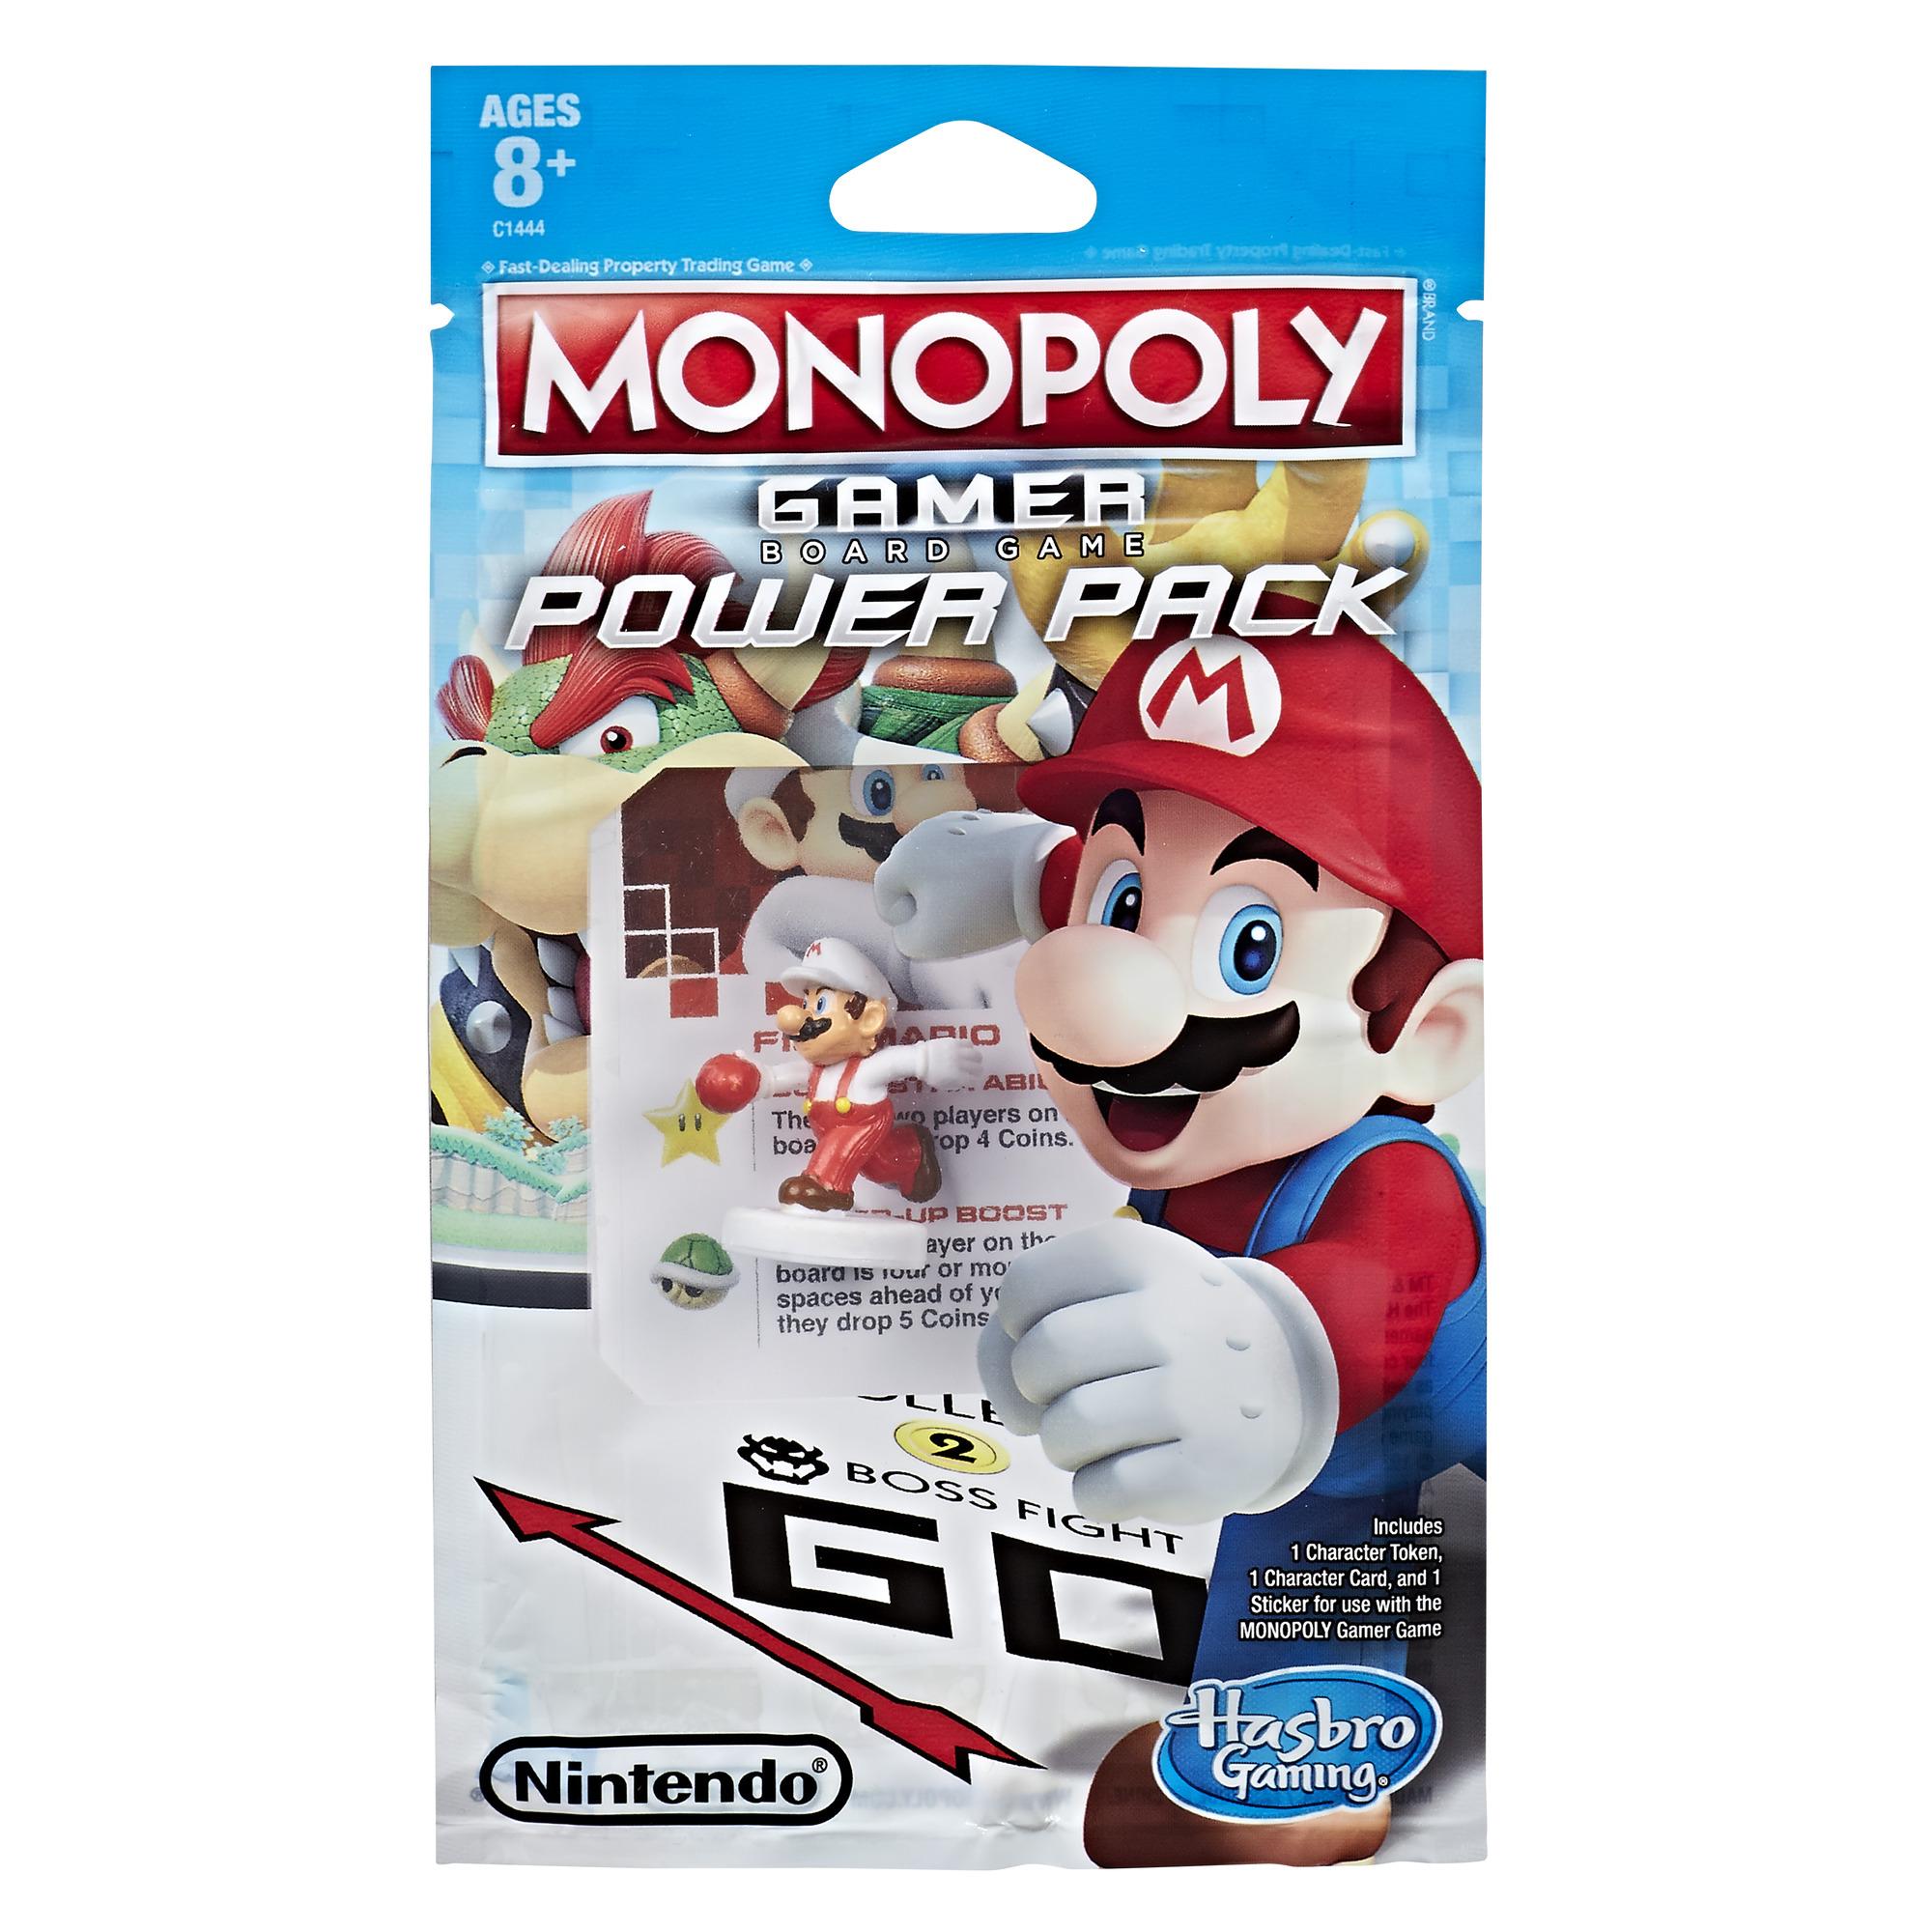 Monopoly Gamer Power Pack eComm Bundle #2